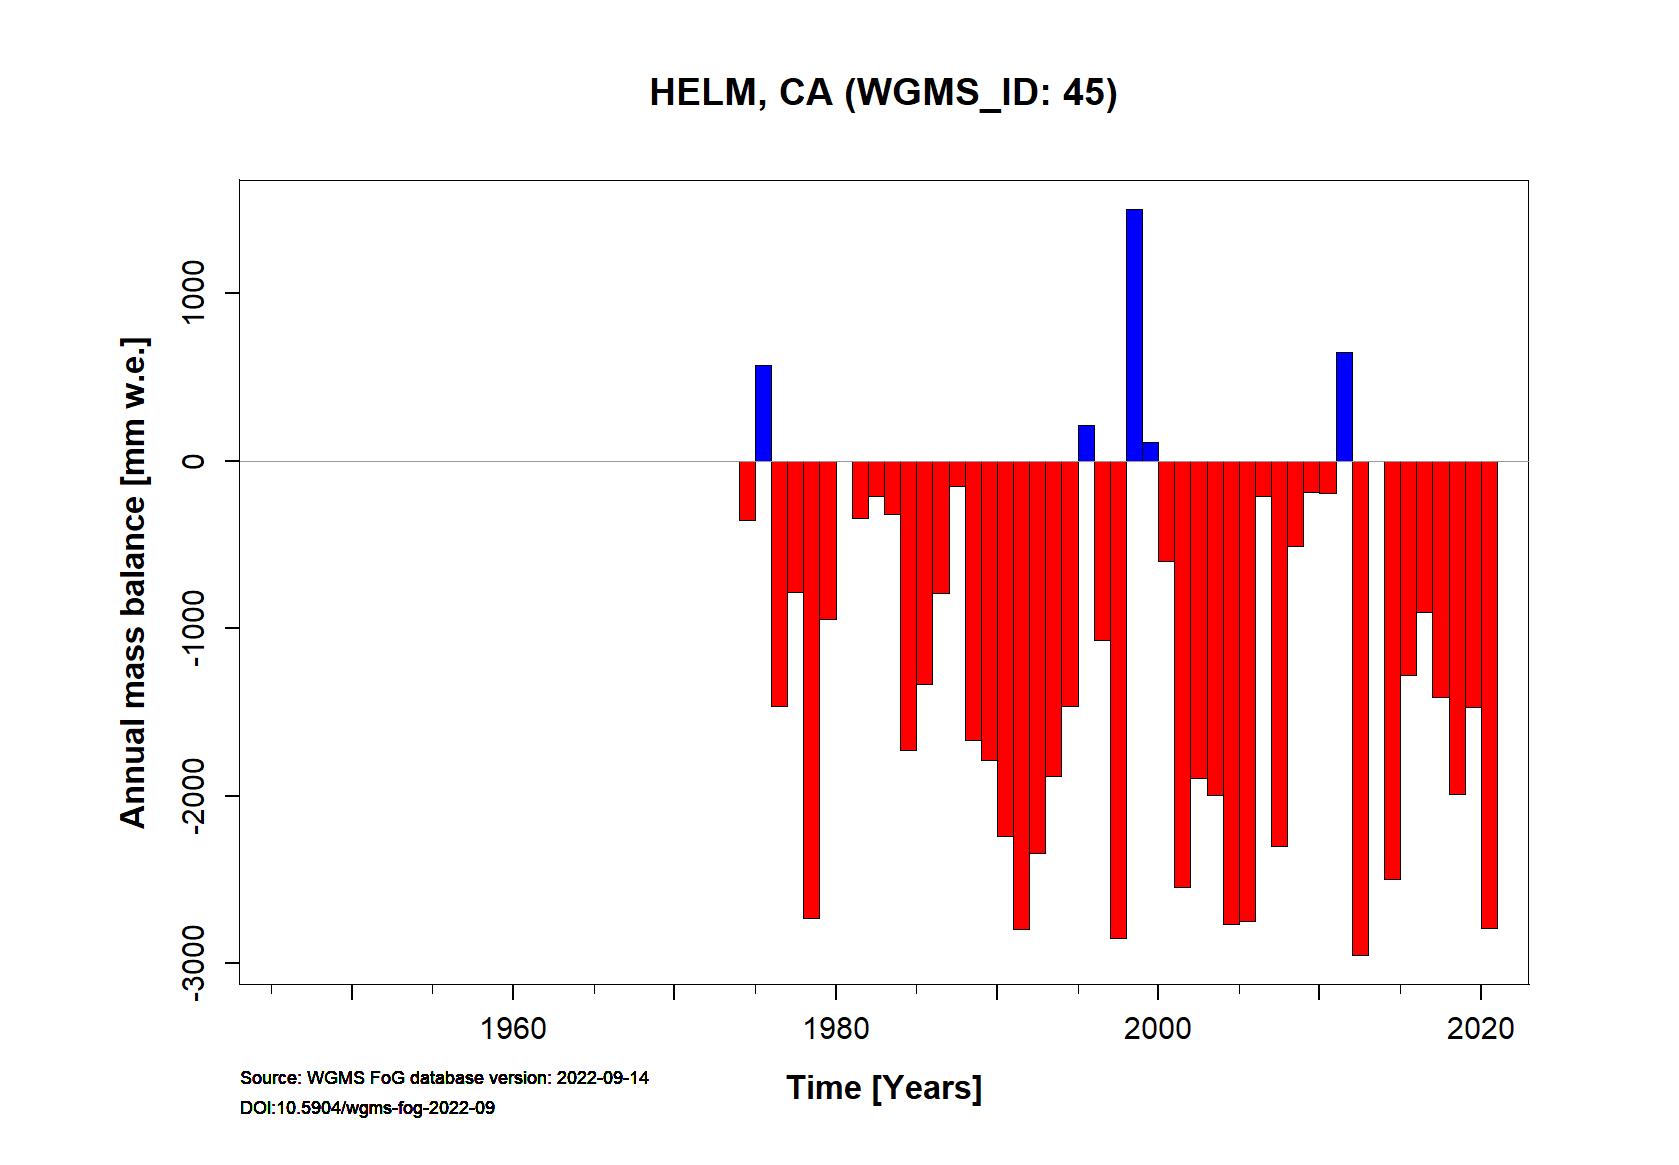 Helm Annual Mass Balance (WGMS, 2016)